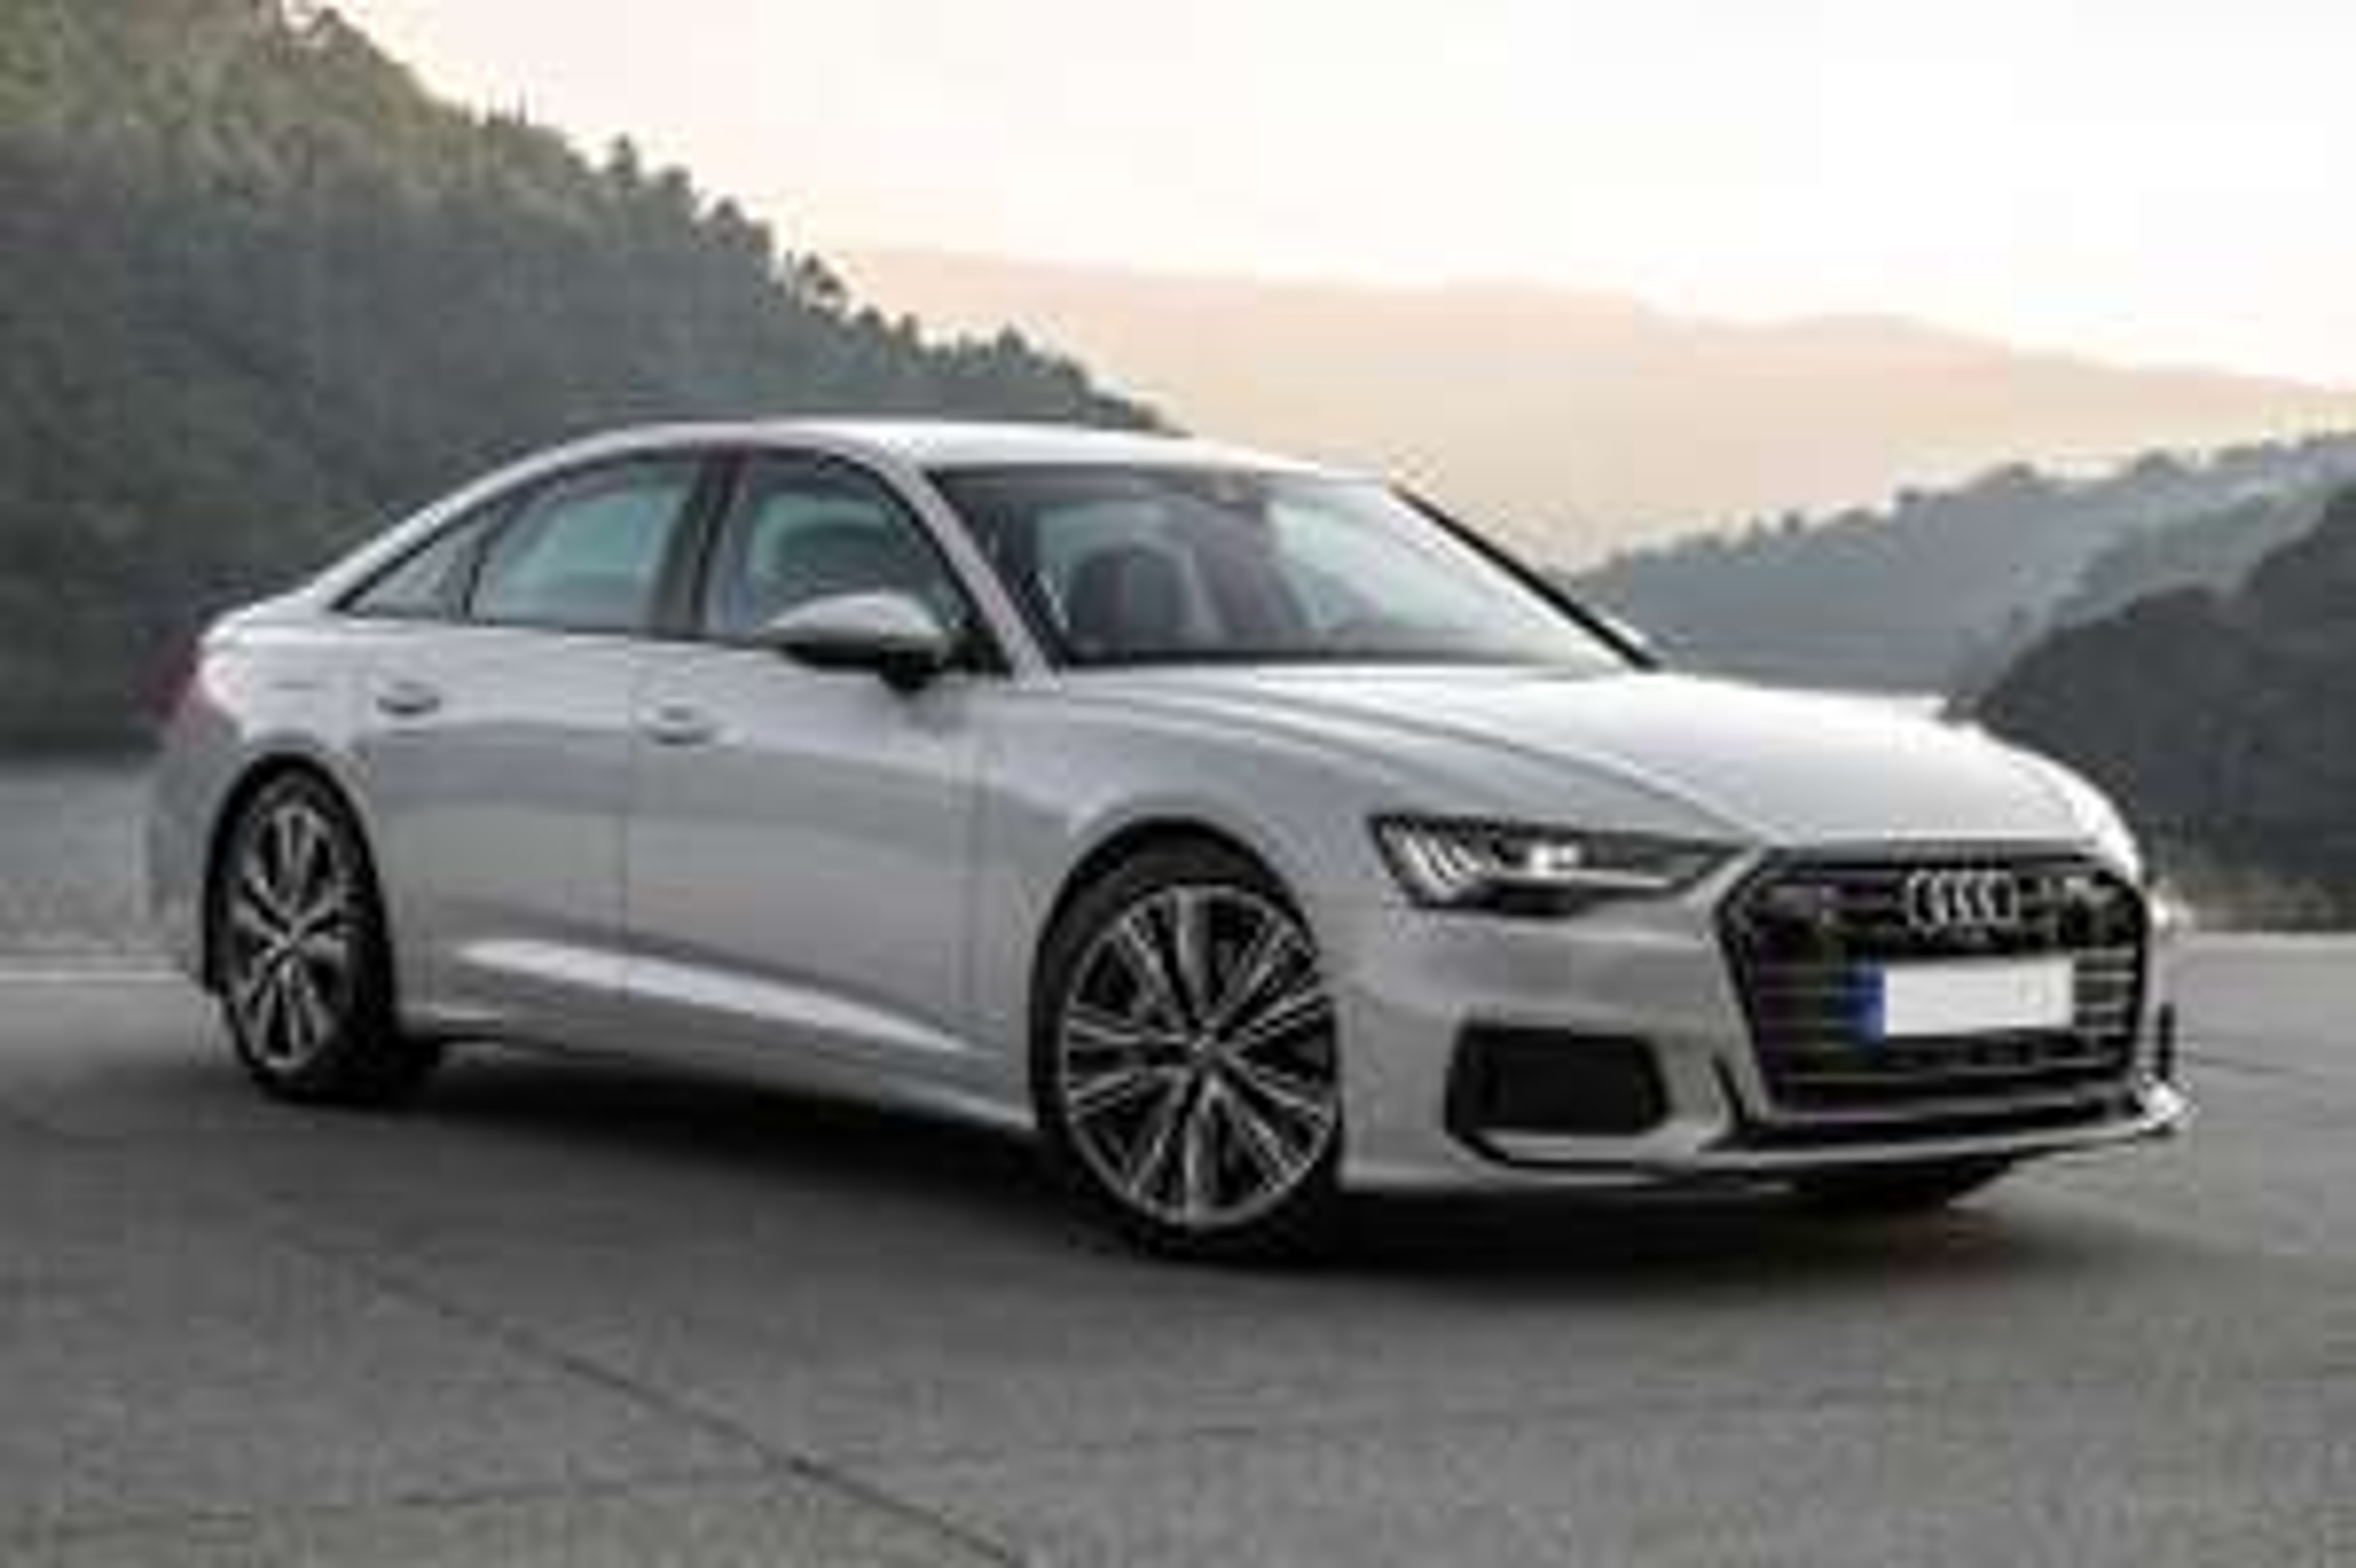 Audi A6 Saloon 40 2.0 TDI Sport 4Dr S Tronic Auto 36m £12,125  10,000 mpa at Hotcarleasing